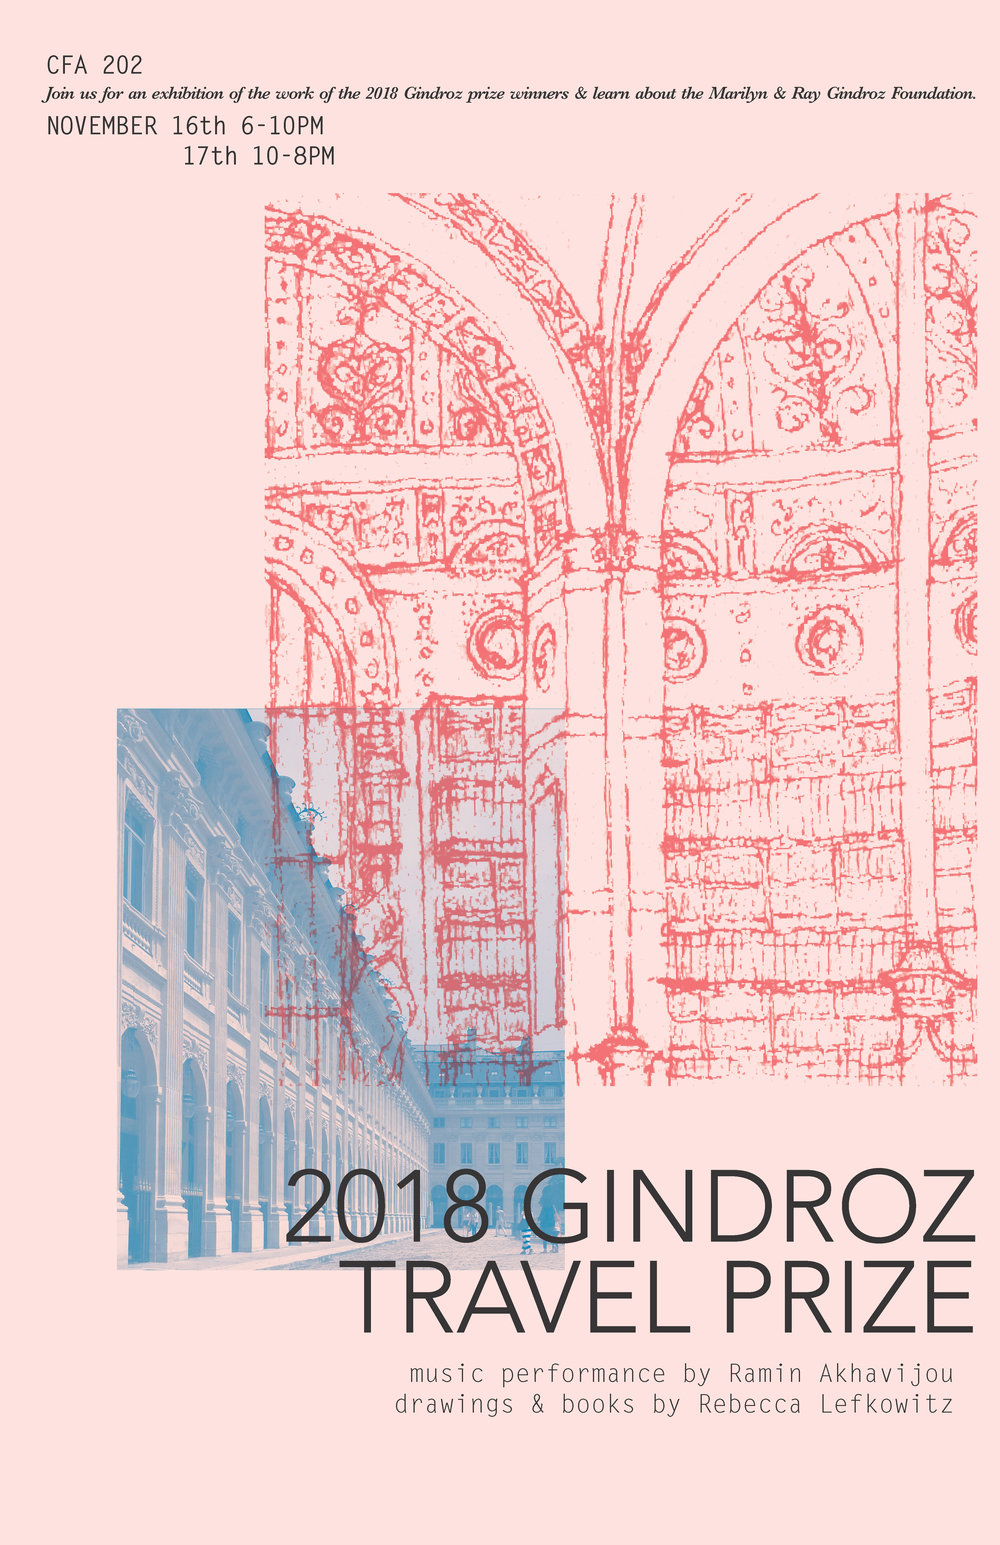 GindrozExhibit-Poster-003 - Rebecca Lefkowitz.jpg